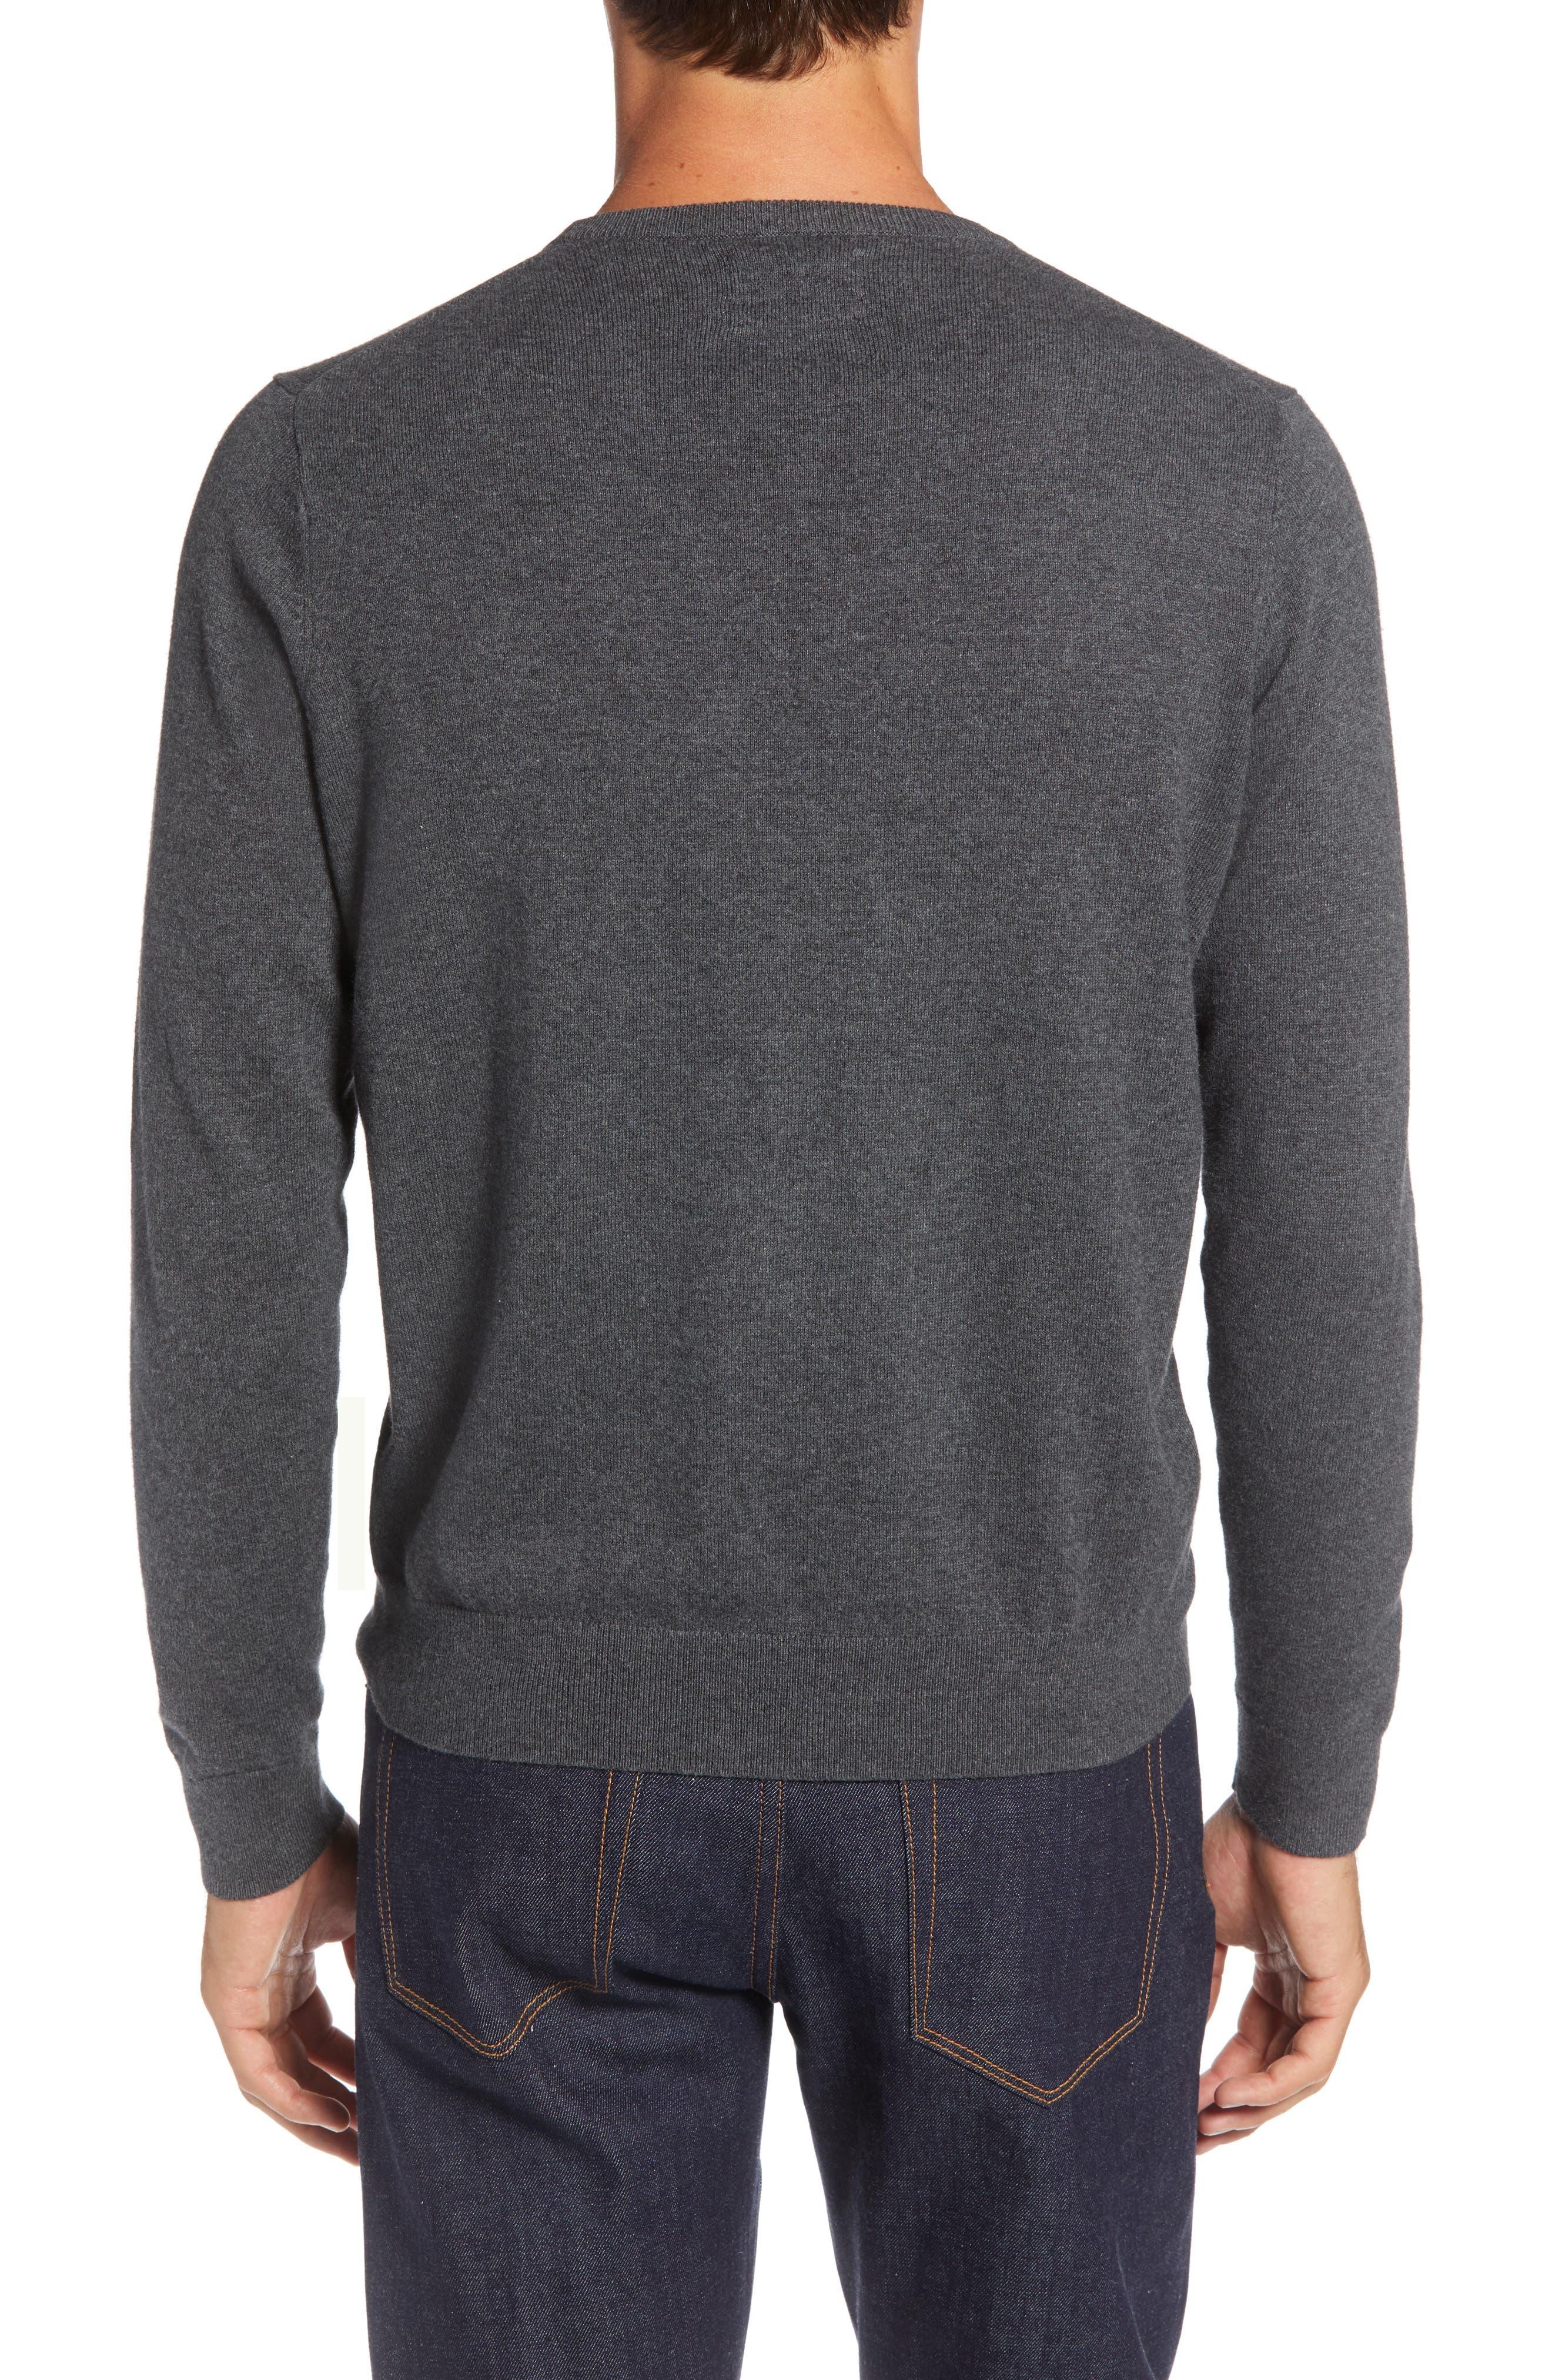 Bear Crewneck Sweater,                             Alternate thumbnail 2, color,                             GREY CASTLEROCK MARL BEAR